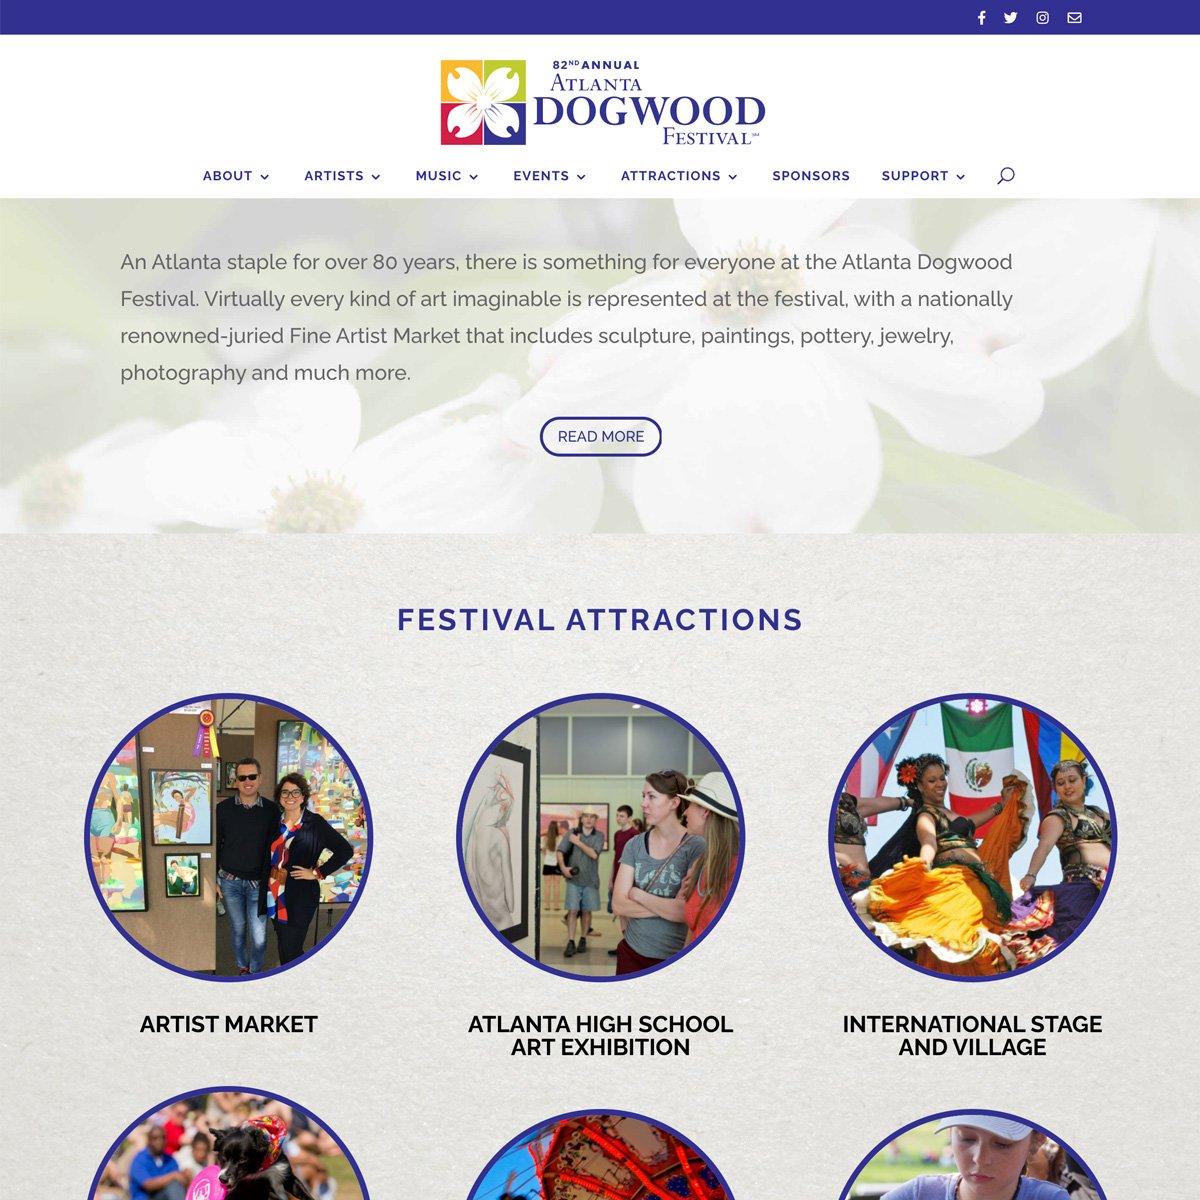 AtlantaDogwood Festival Web Design - Desktop